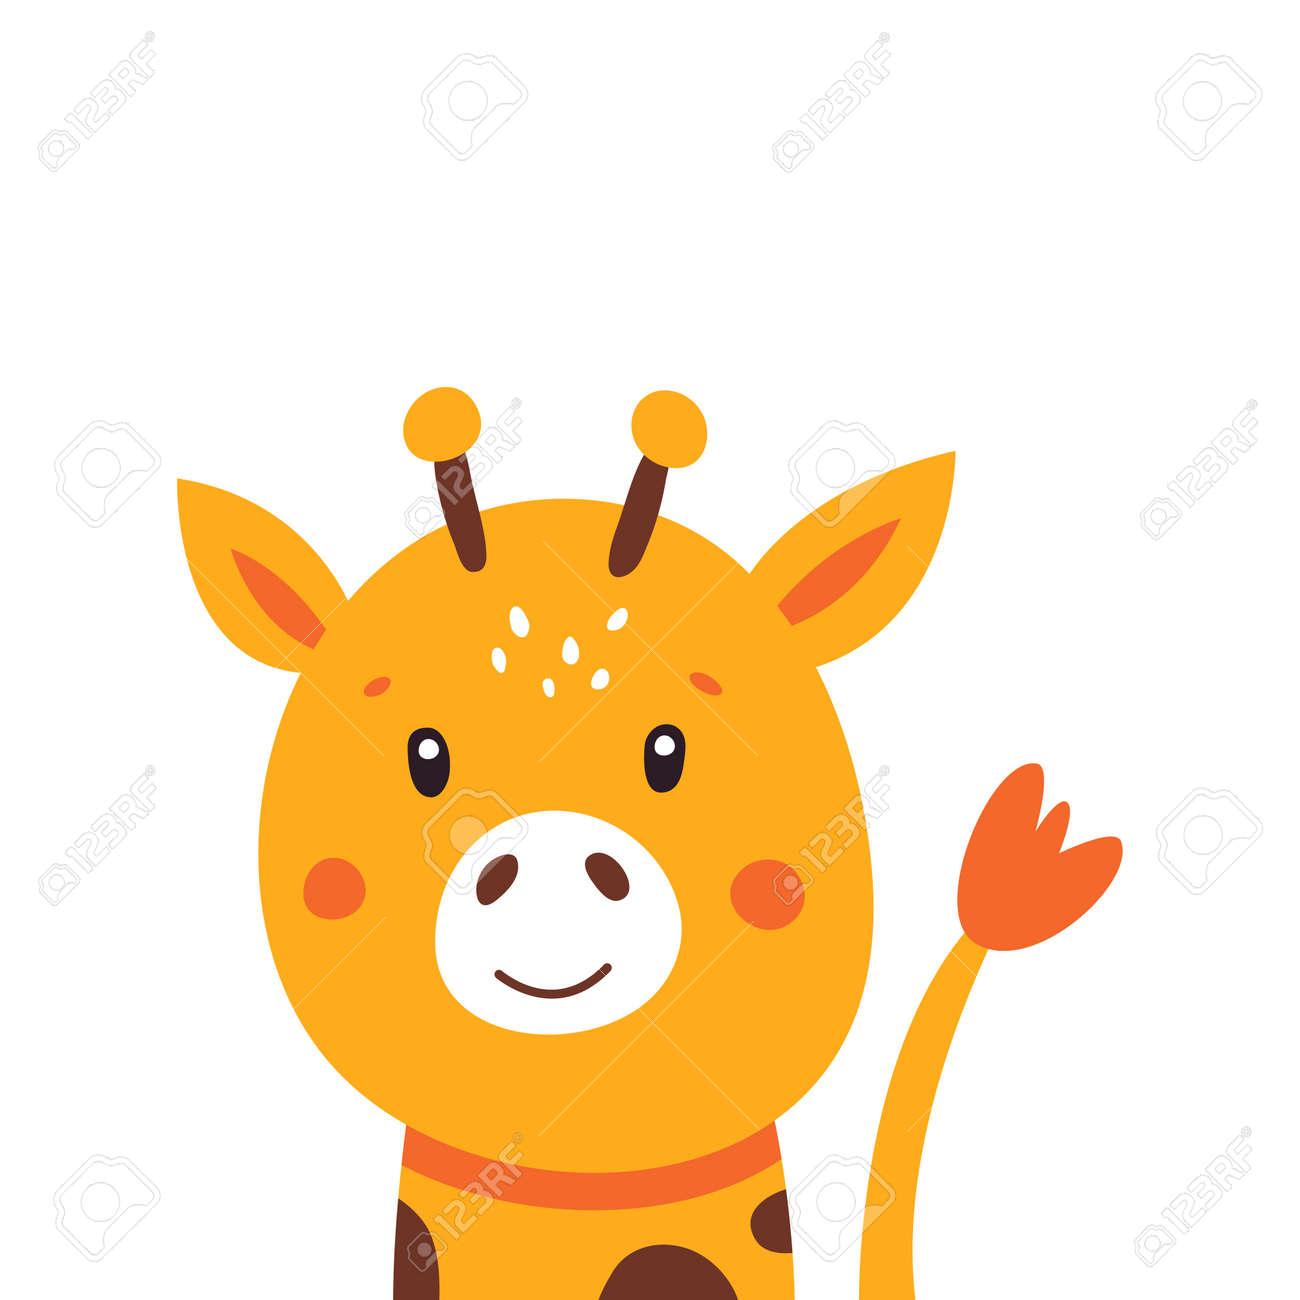 Illustration of a little cute giraffe on a white background. Vector illustration. - 169771668